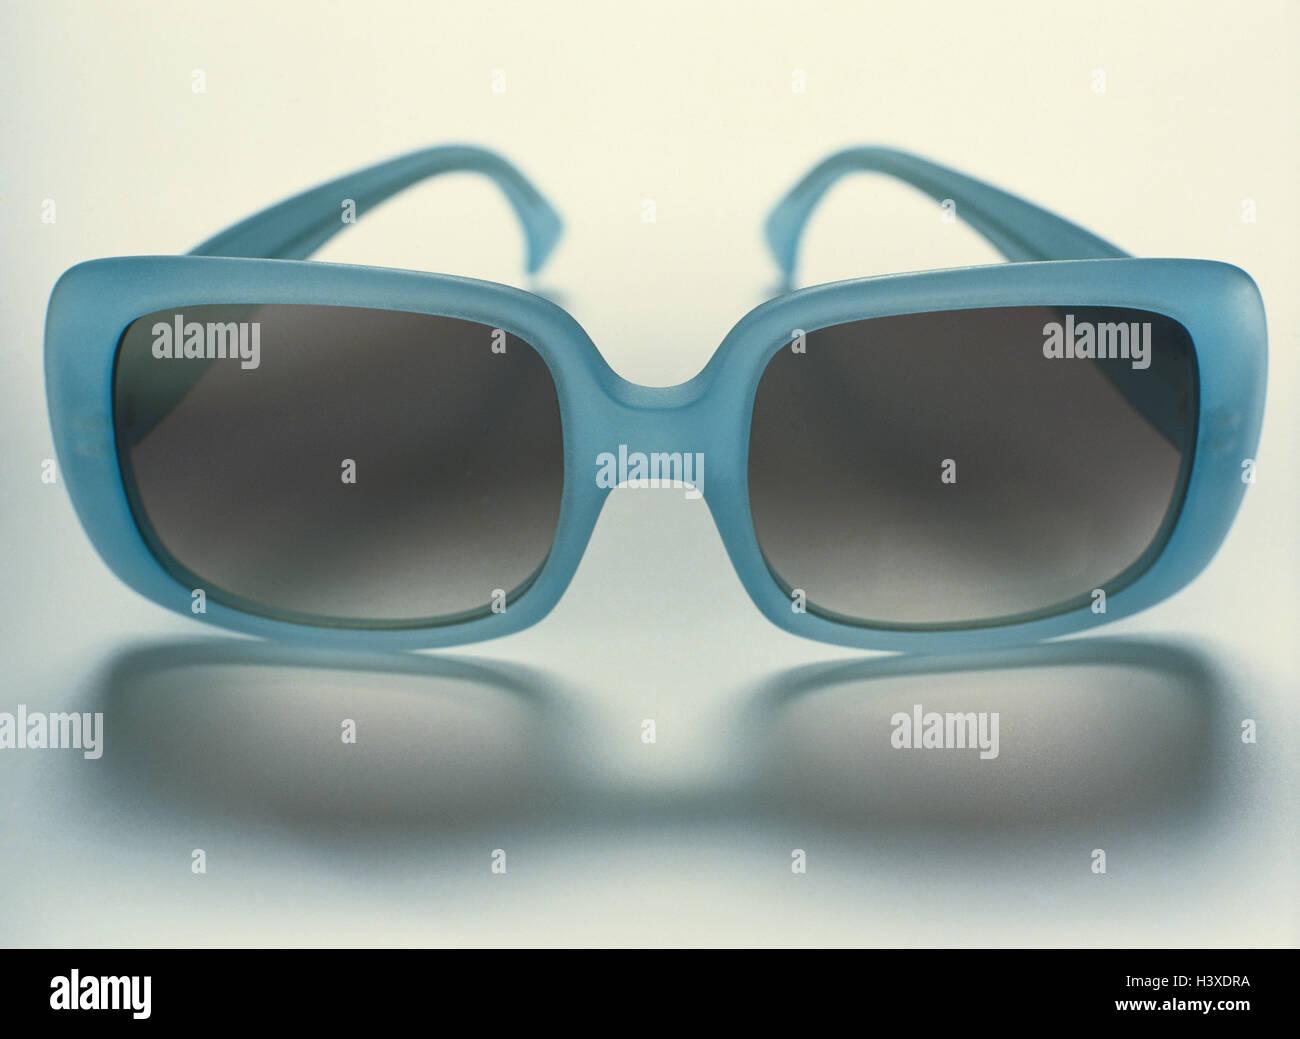 d9a46788a66 Glasses Blue Cut Out Stock Photos   Glasses Blue Cut Out Stock ...